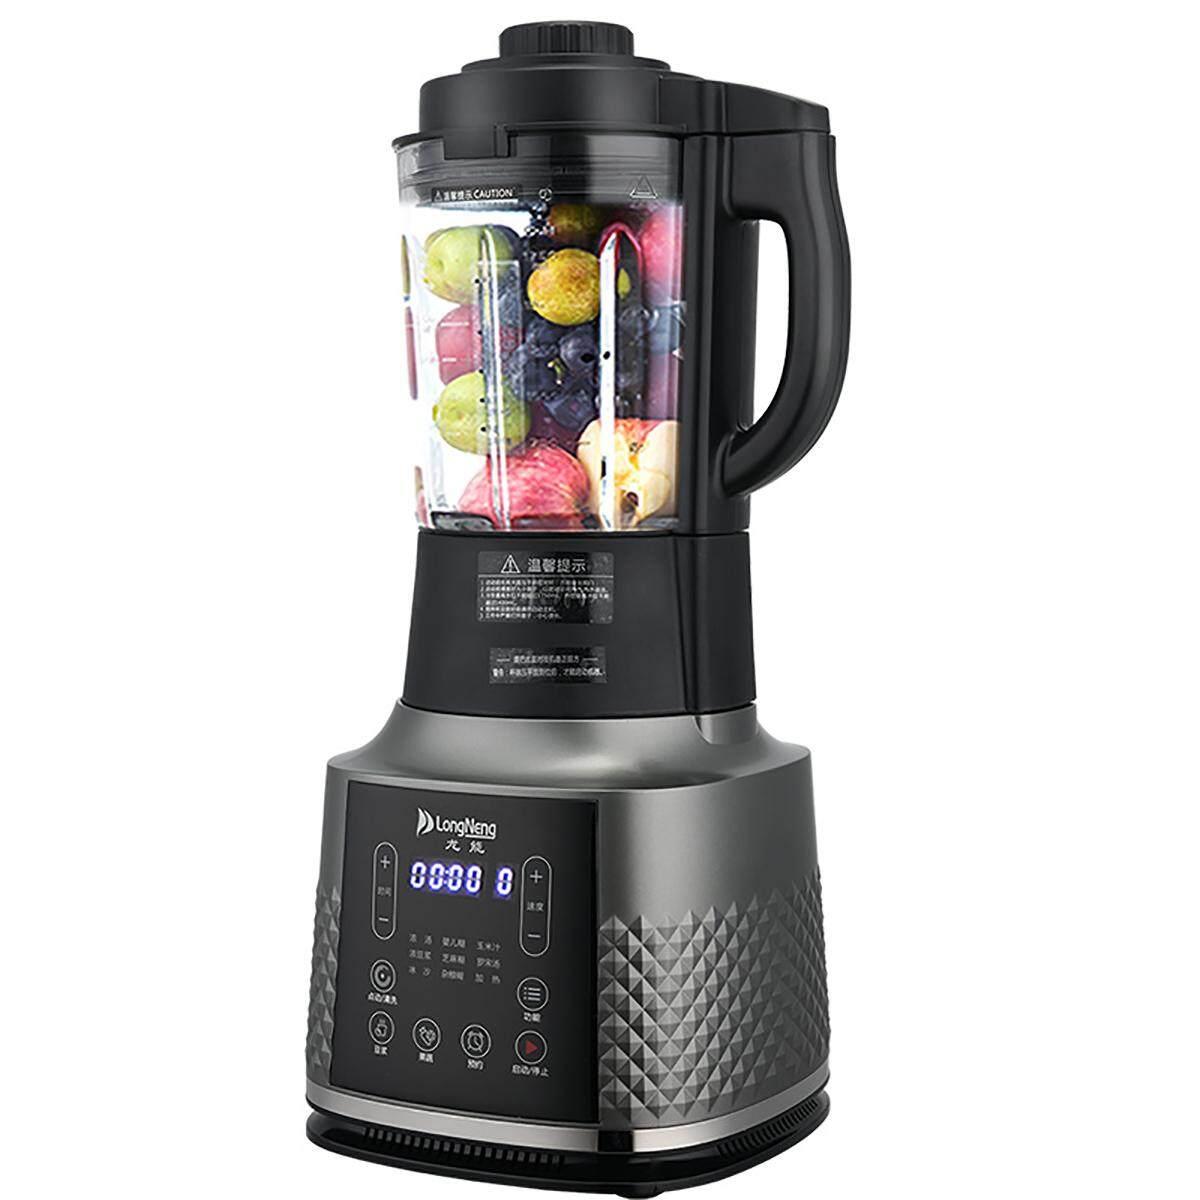 1.7L Multi-functional Mixer Grinder Blender Machine Knead Fruit Juicer Baby Food